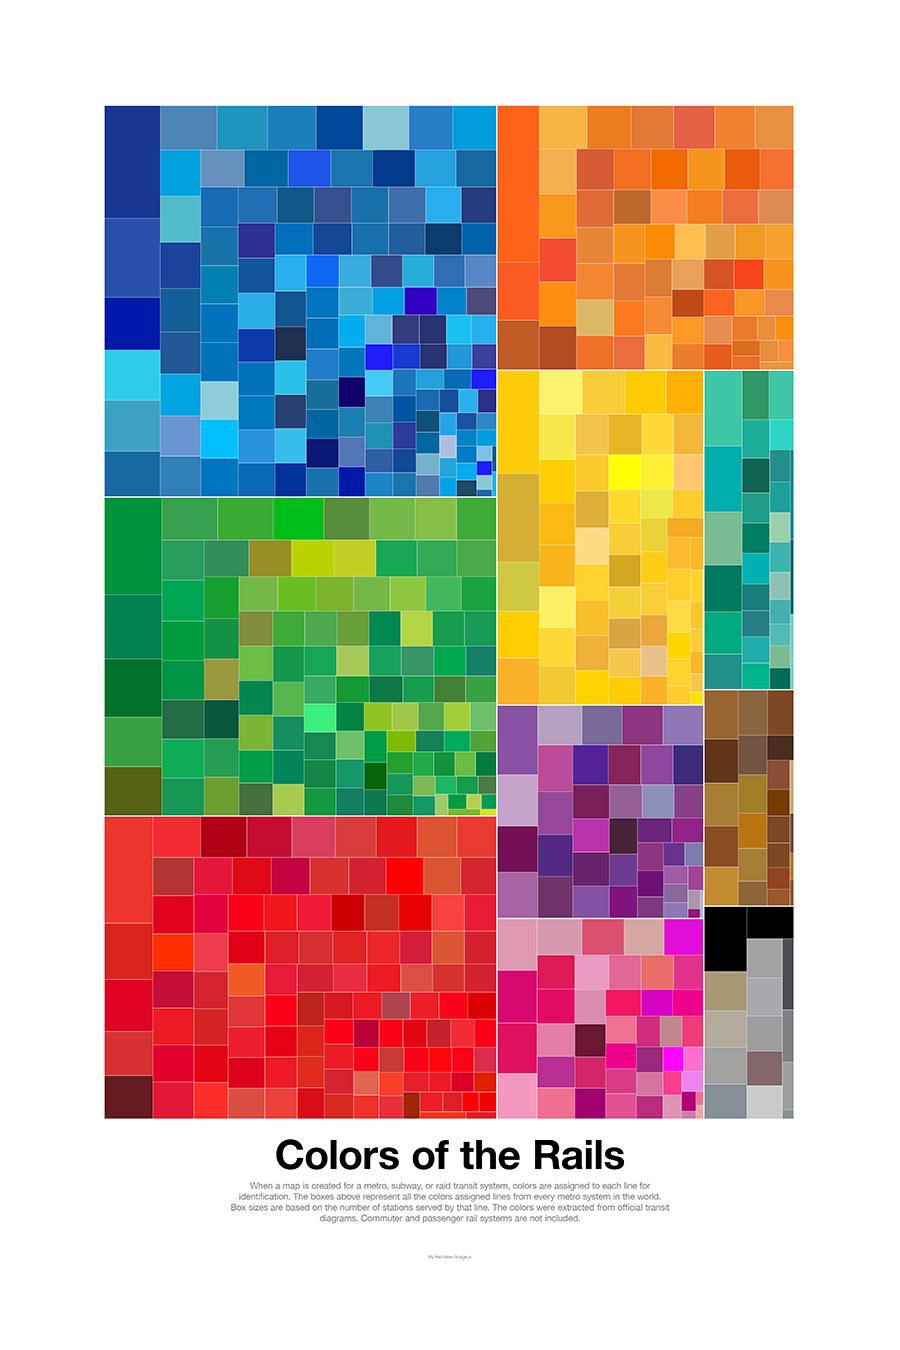 Colors of the Rails (Light)